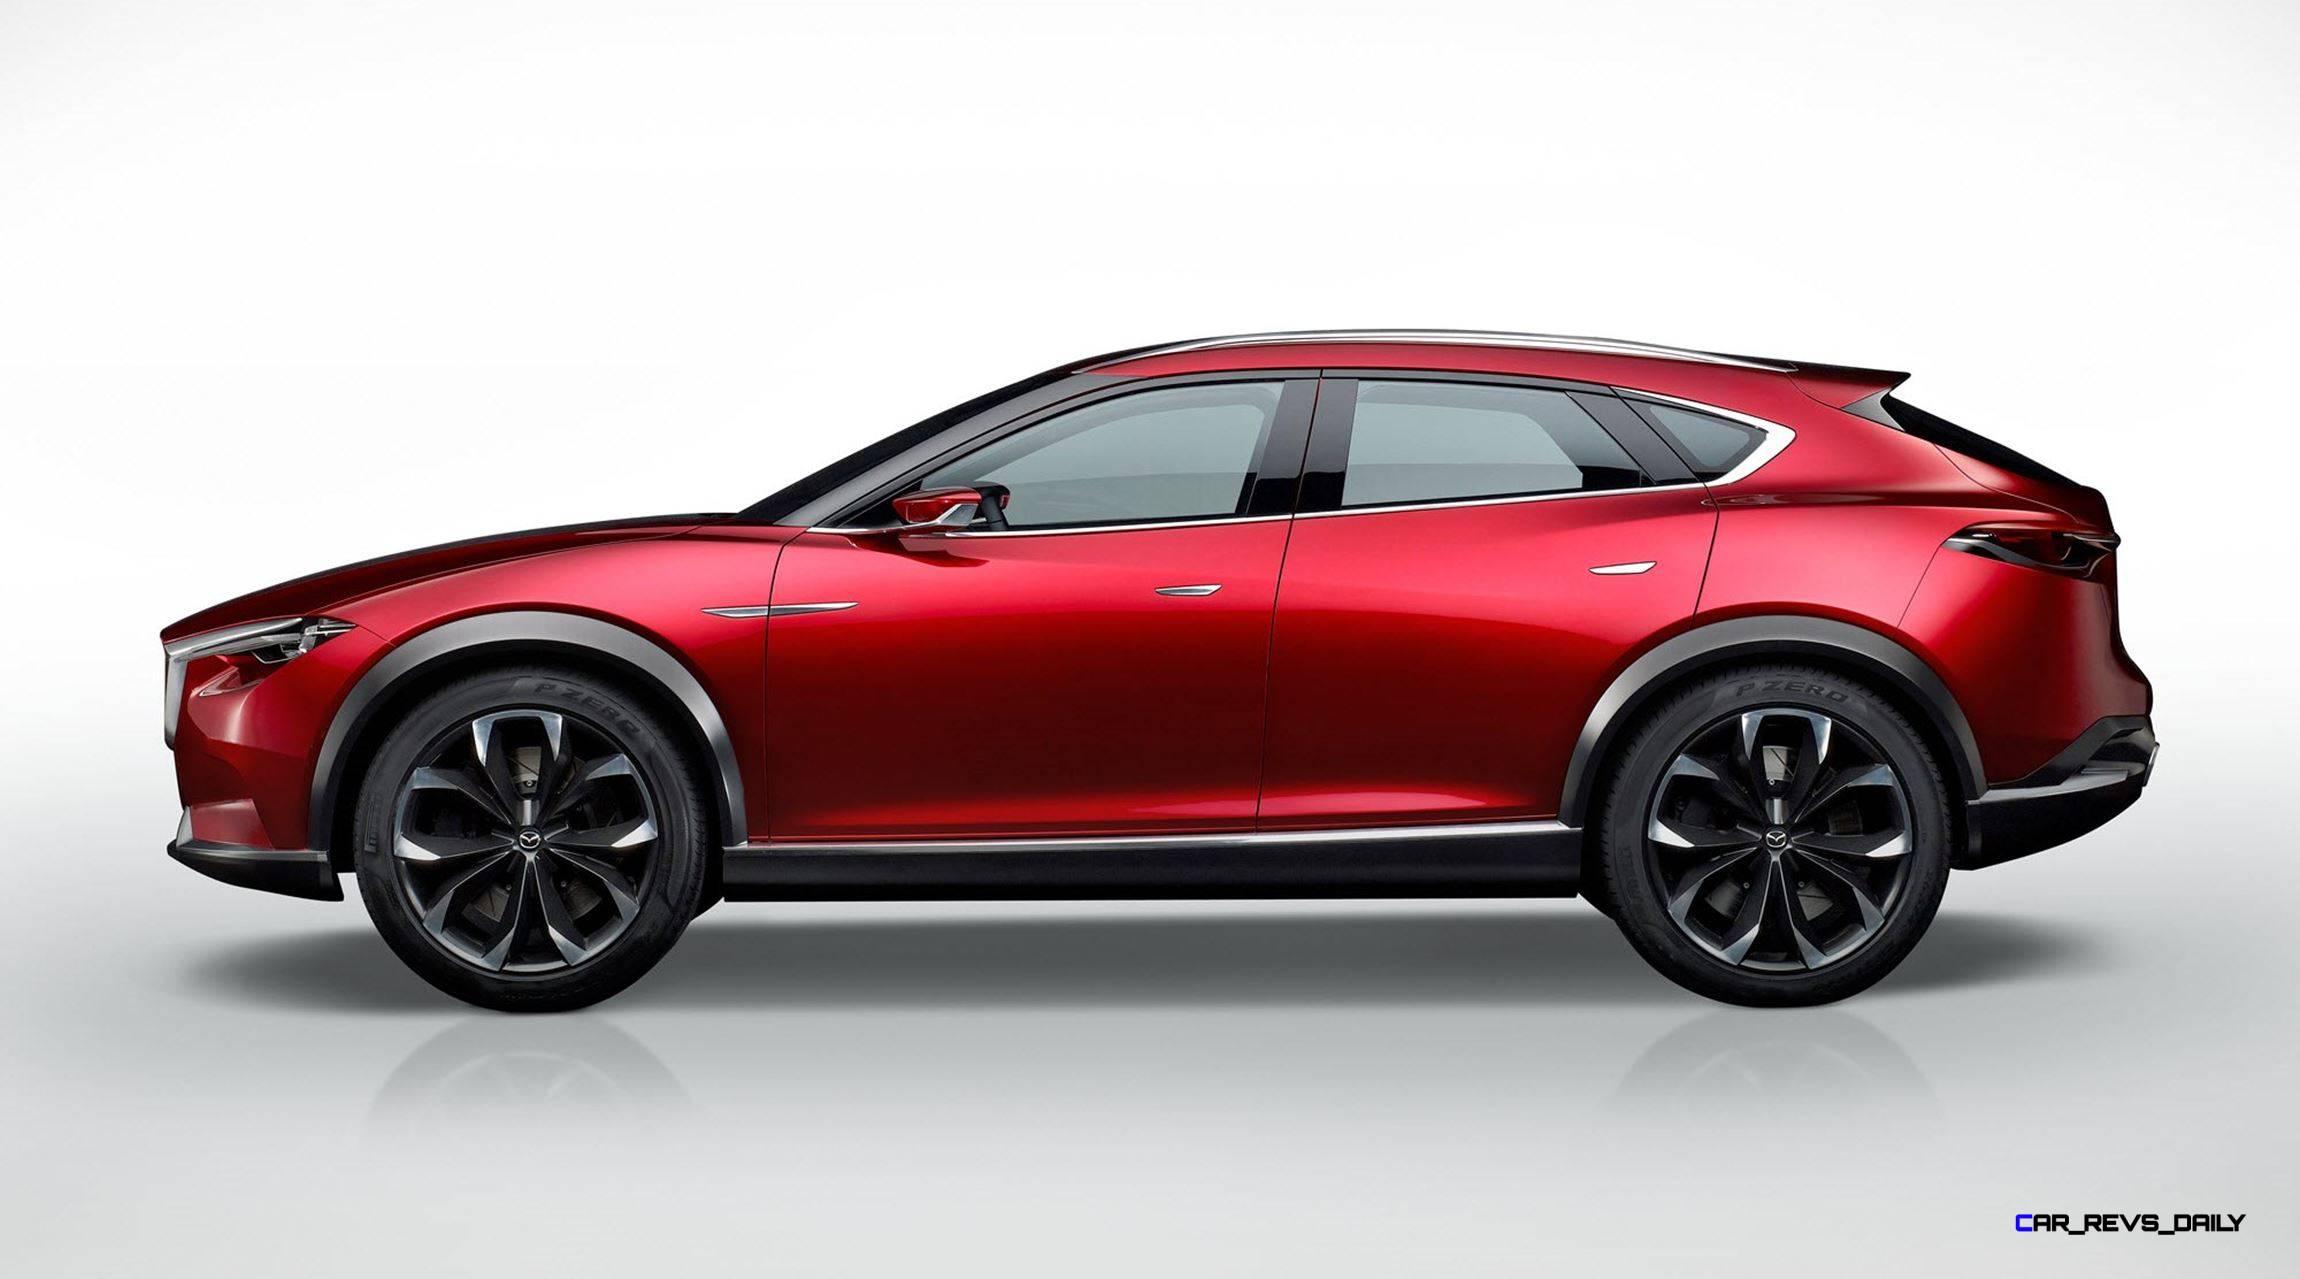 2015 Mazda KOERU Concept - 161.8KB